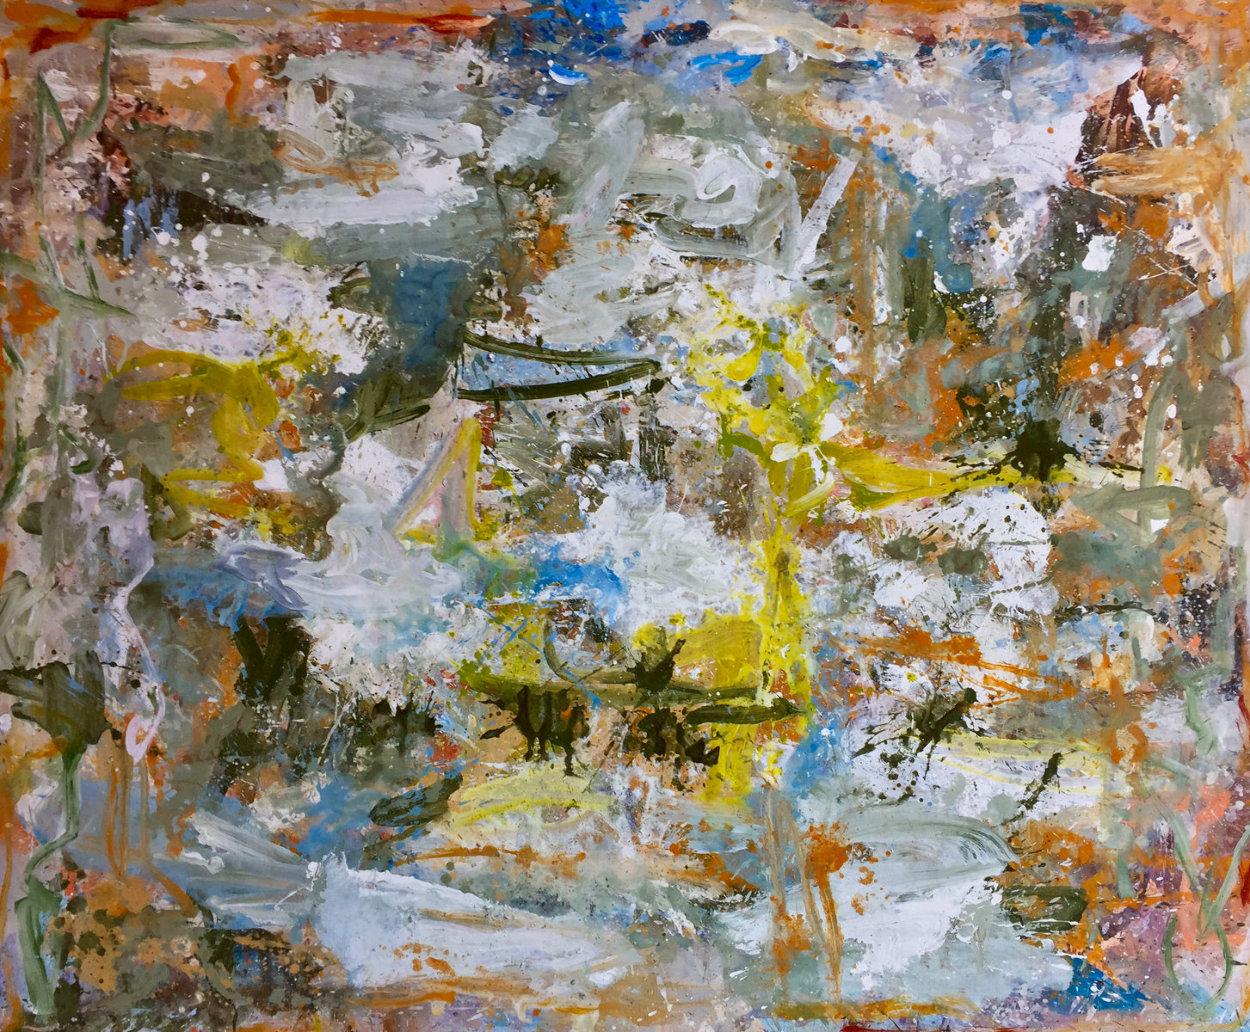 Cosmic Patterns 2017 81x97 Huge Original Painting by Costel Iarca